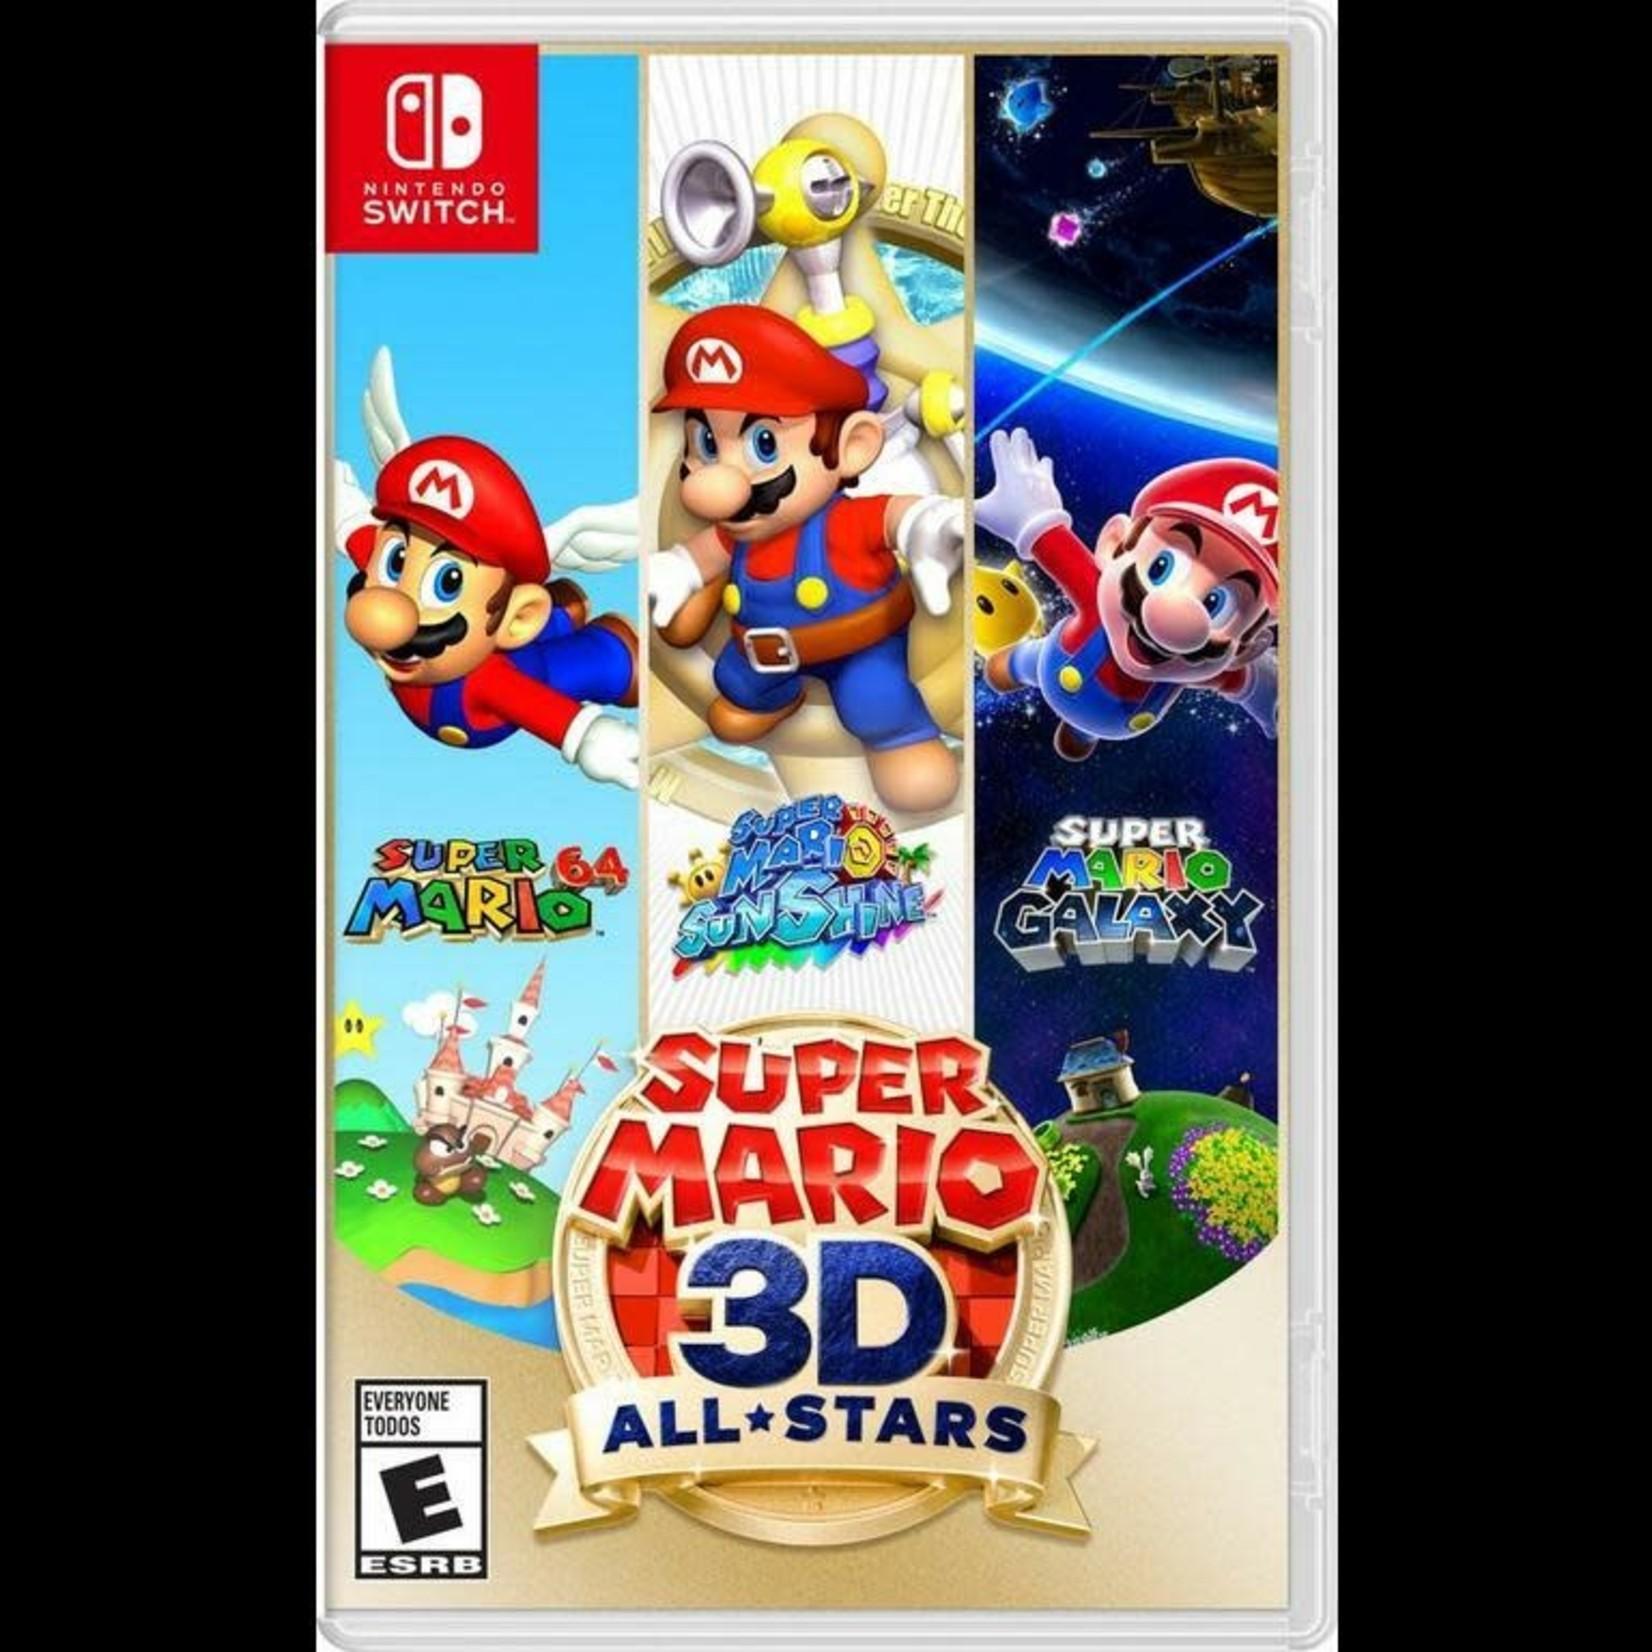 switchu-Super Mario 3D All-Stars